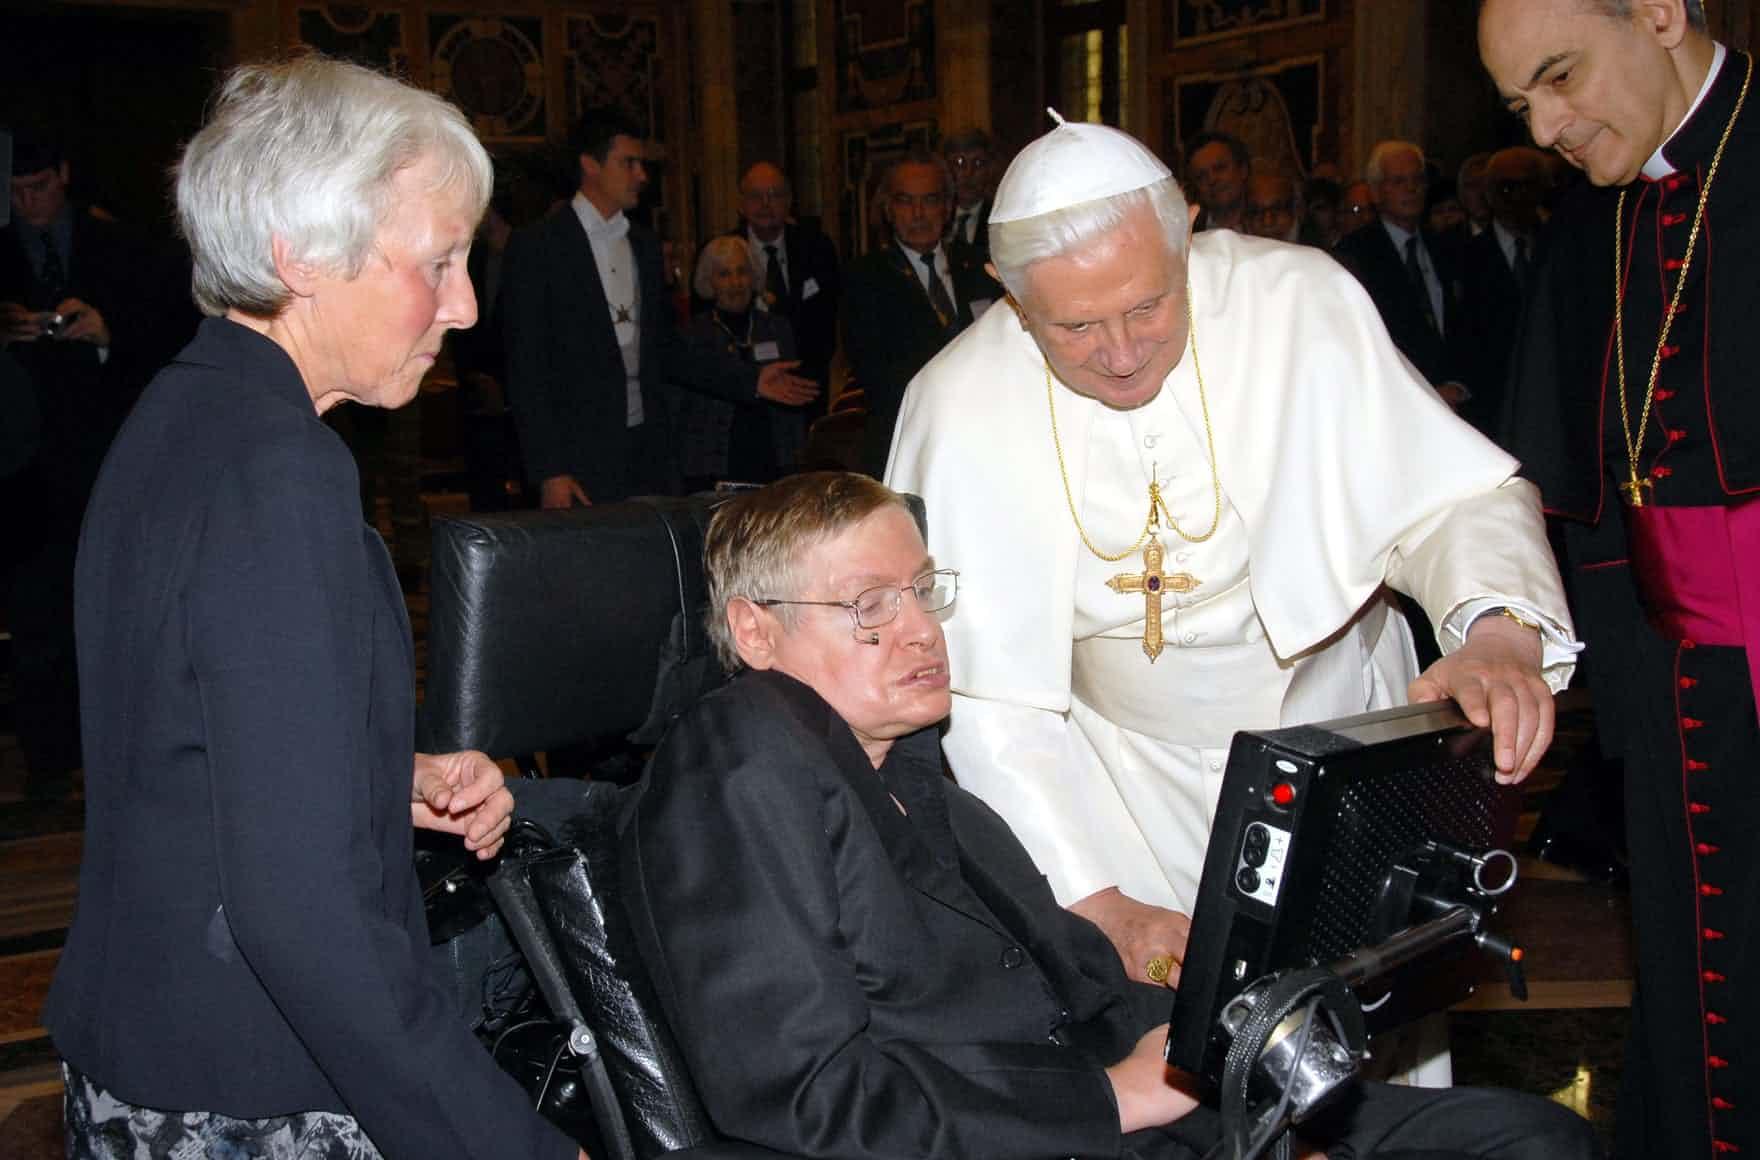 Stephen Hawking 12 -elleman